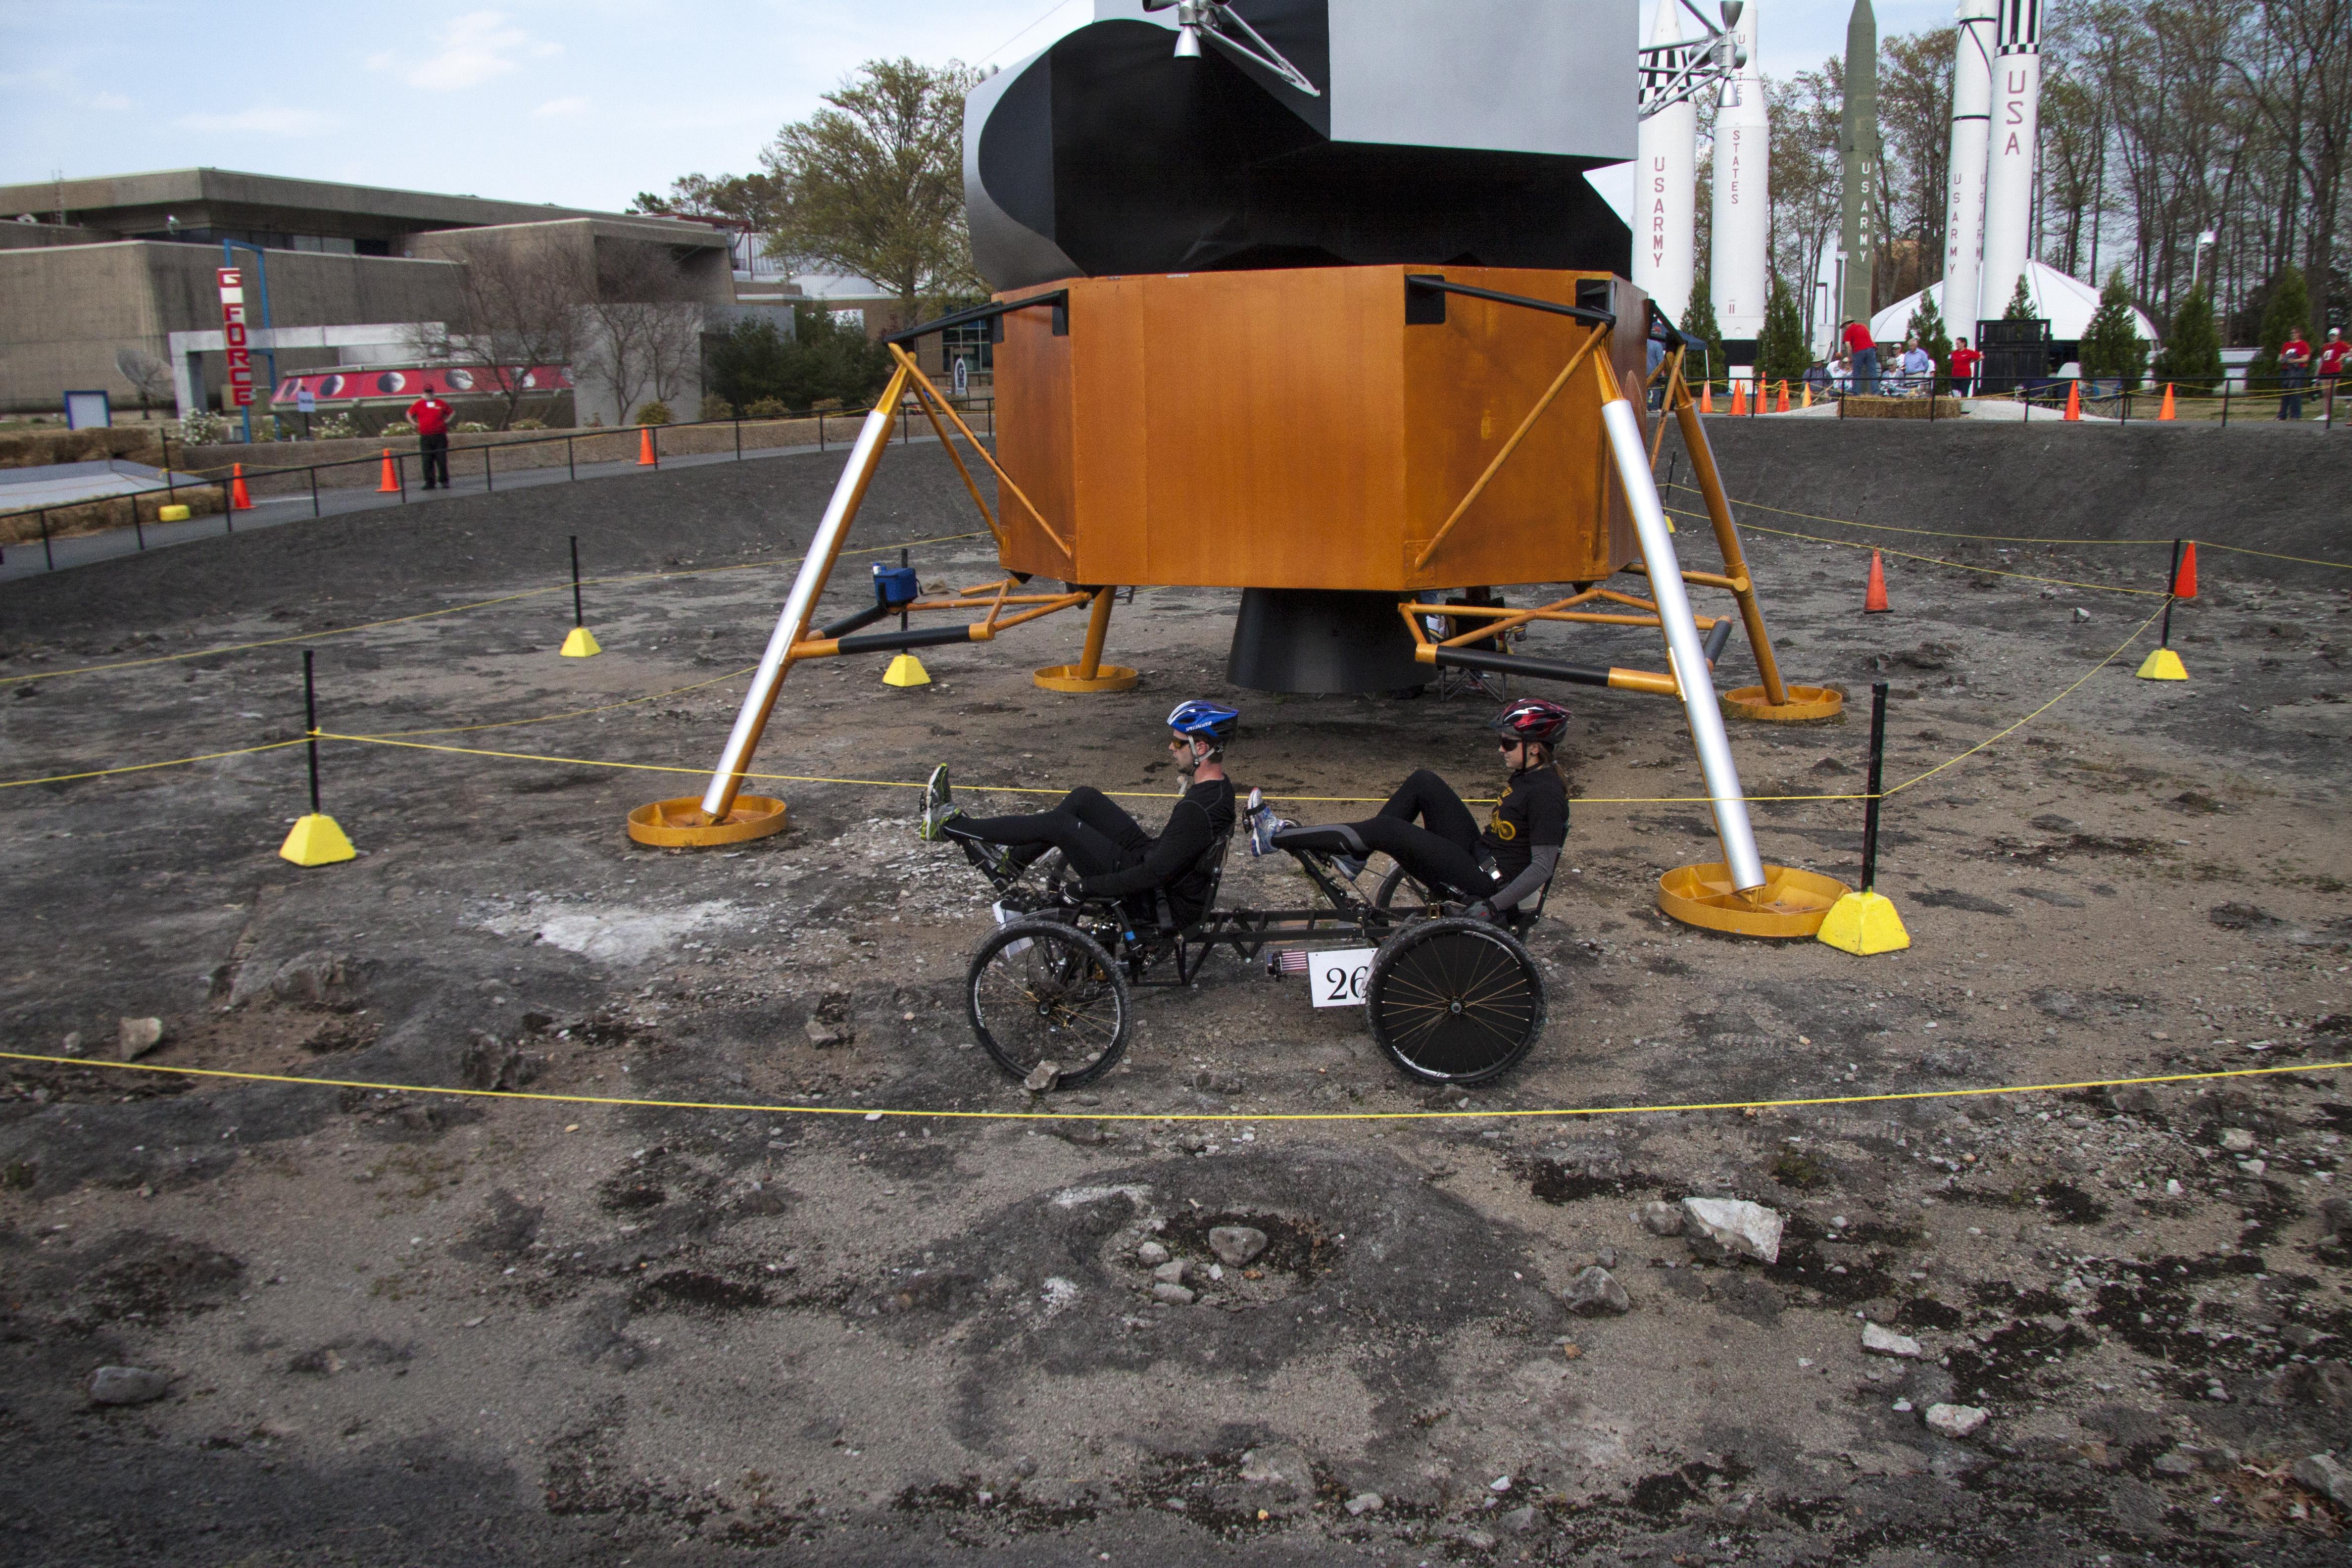 NASA Rover Challenge, SIUC Design Team | Indiegogo